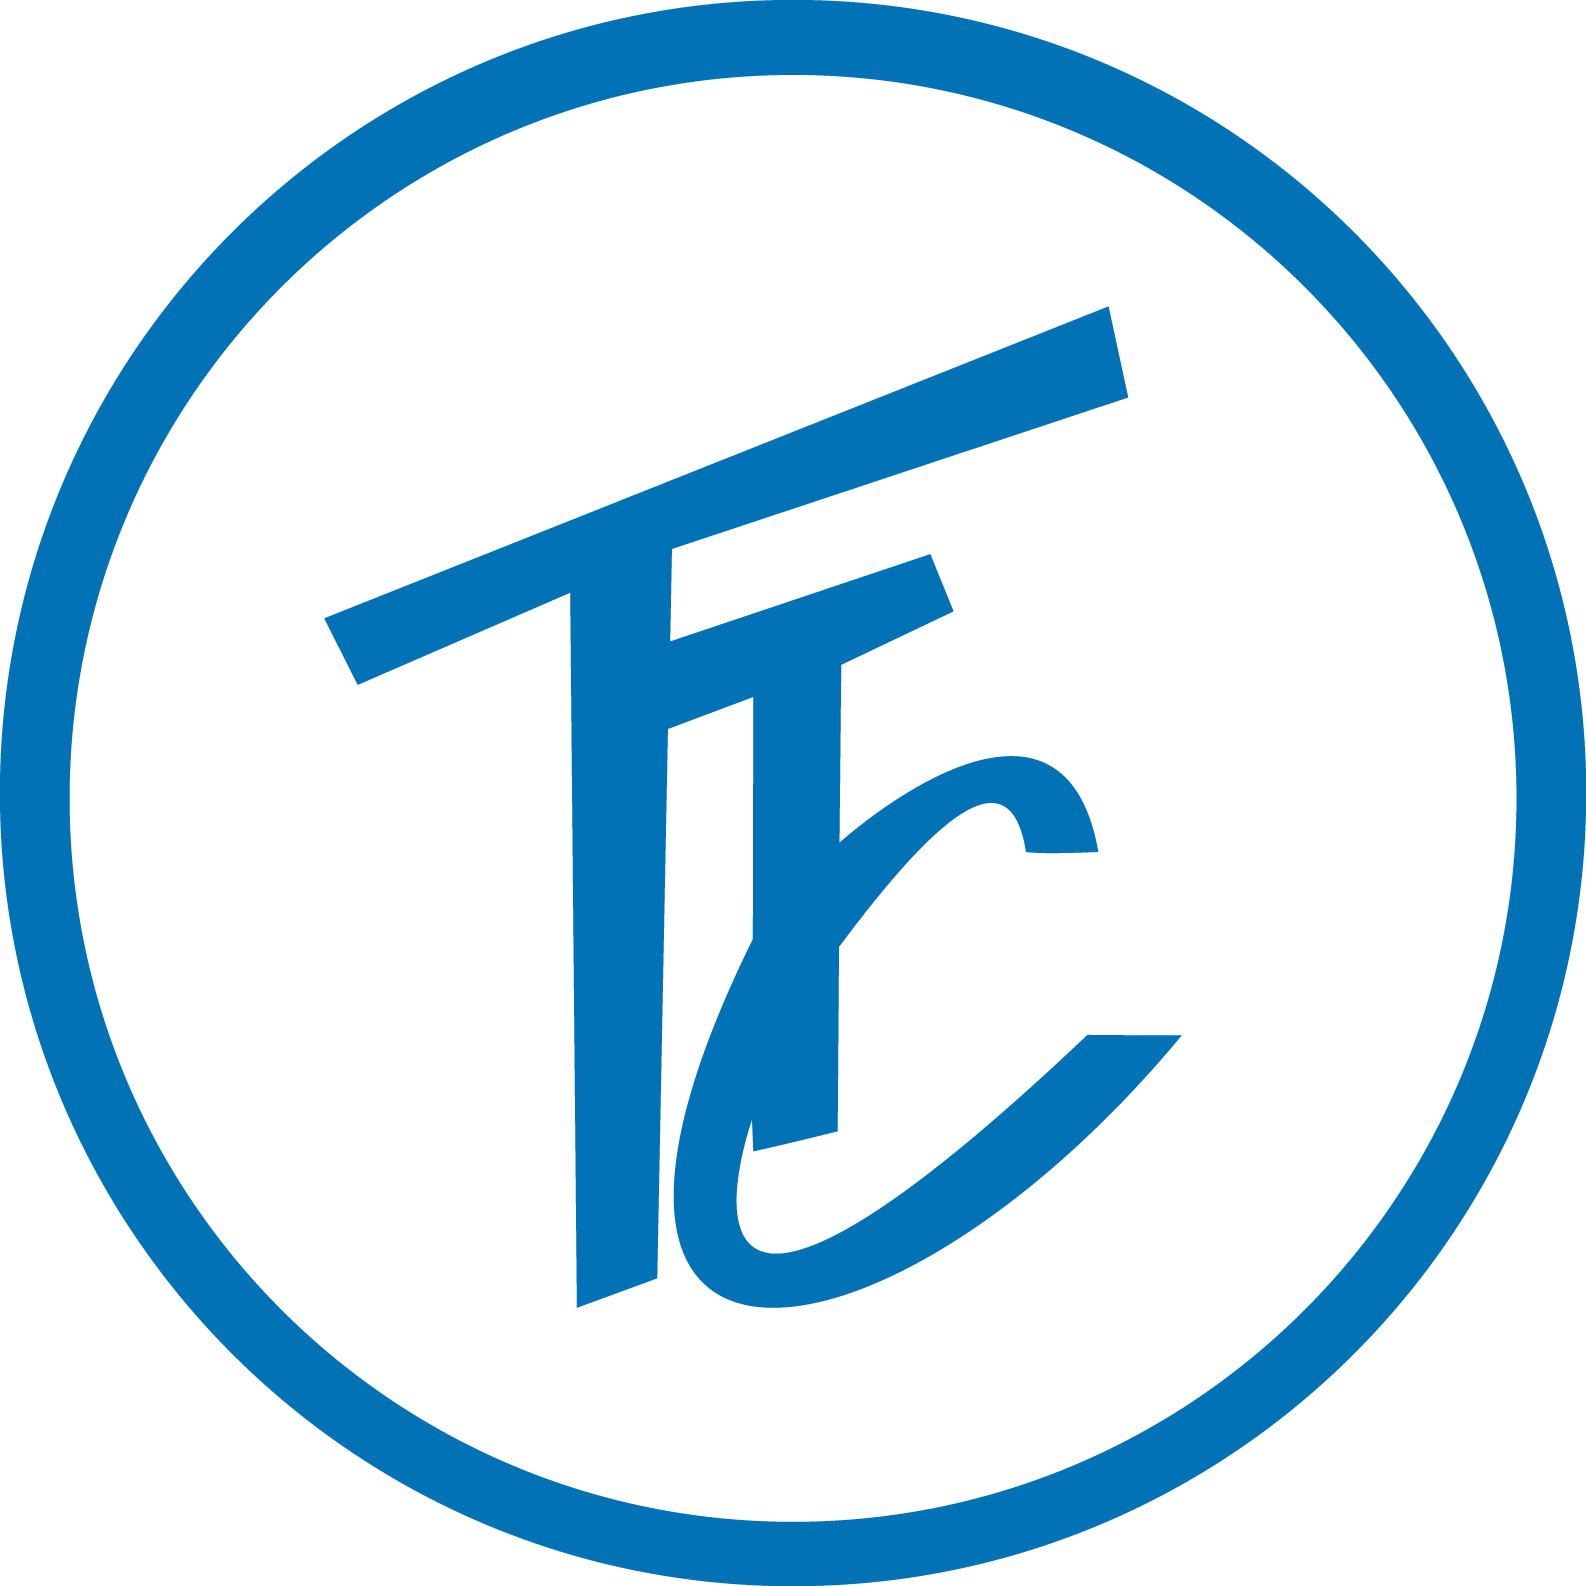 La société TTC déménage!